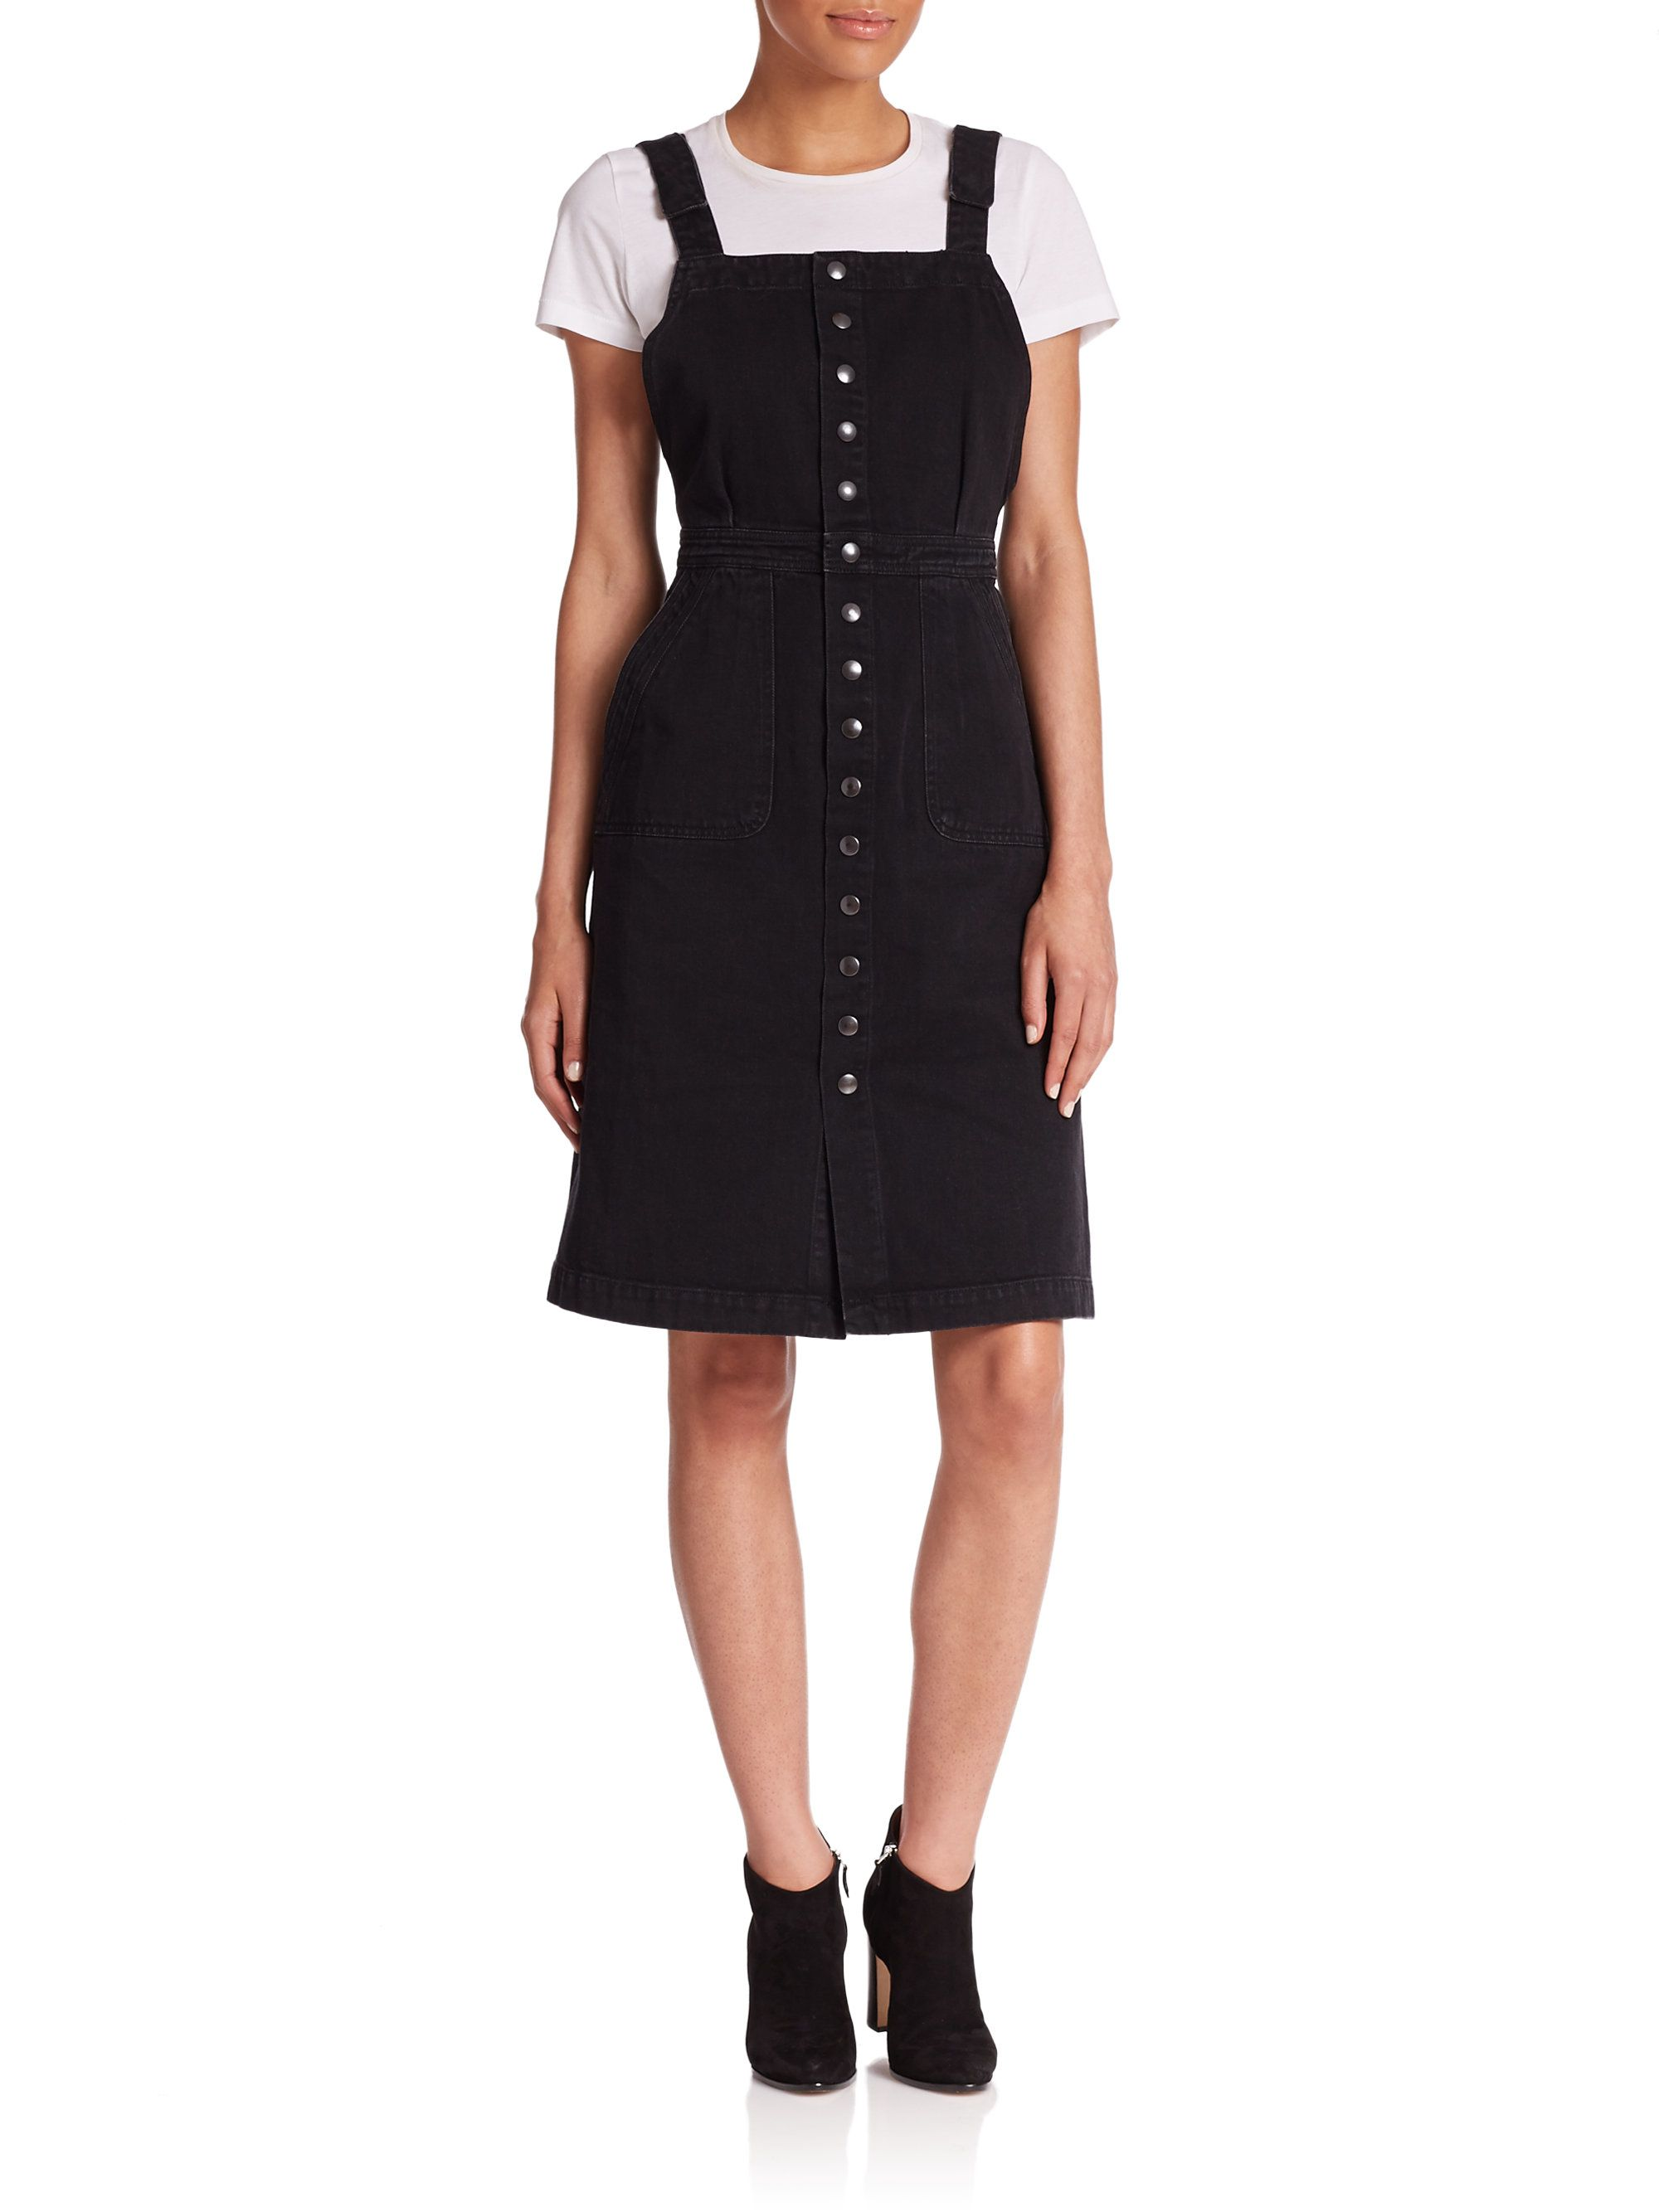 Mih Jeans Black Eastman Denim Overall Dress Denim Overall Dress Clothes Overall Dress [ 2667 x 2000 Pixel ]